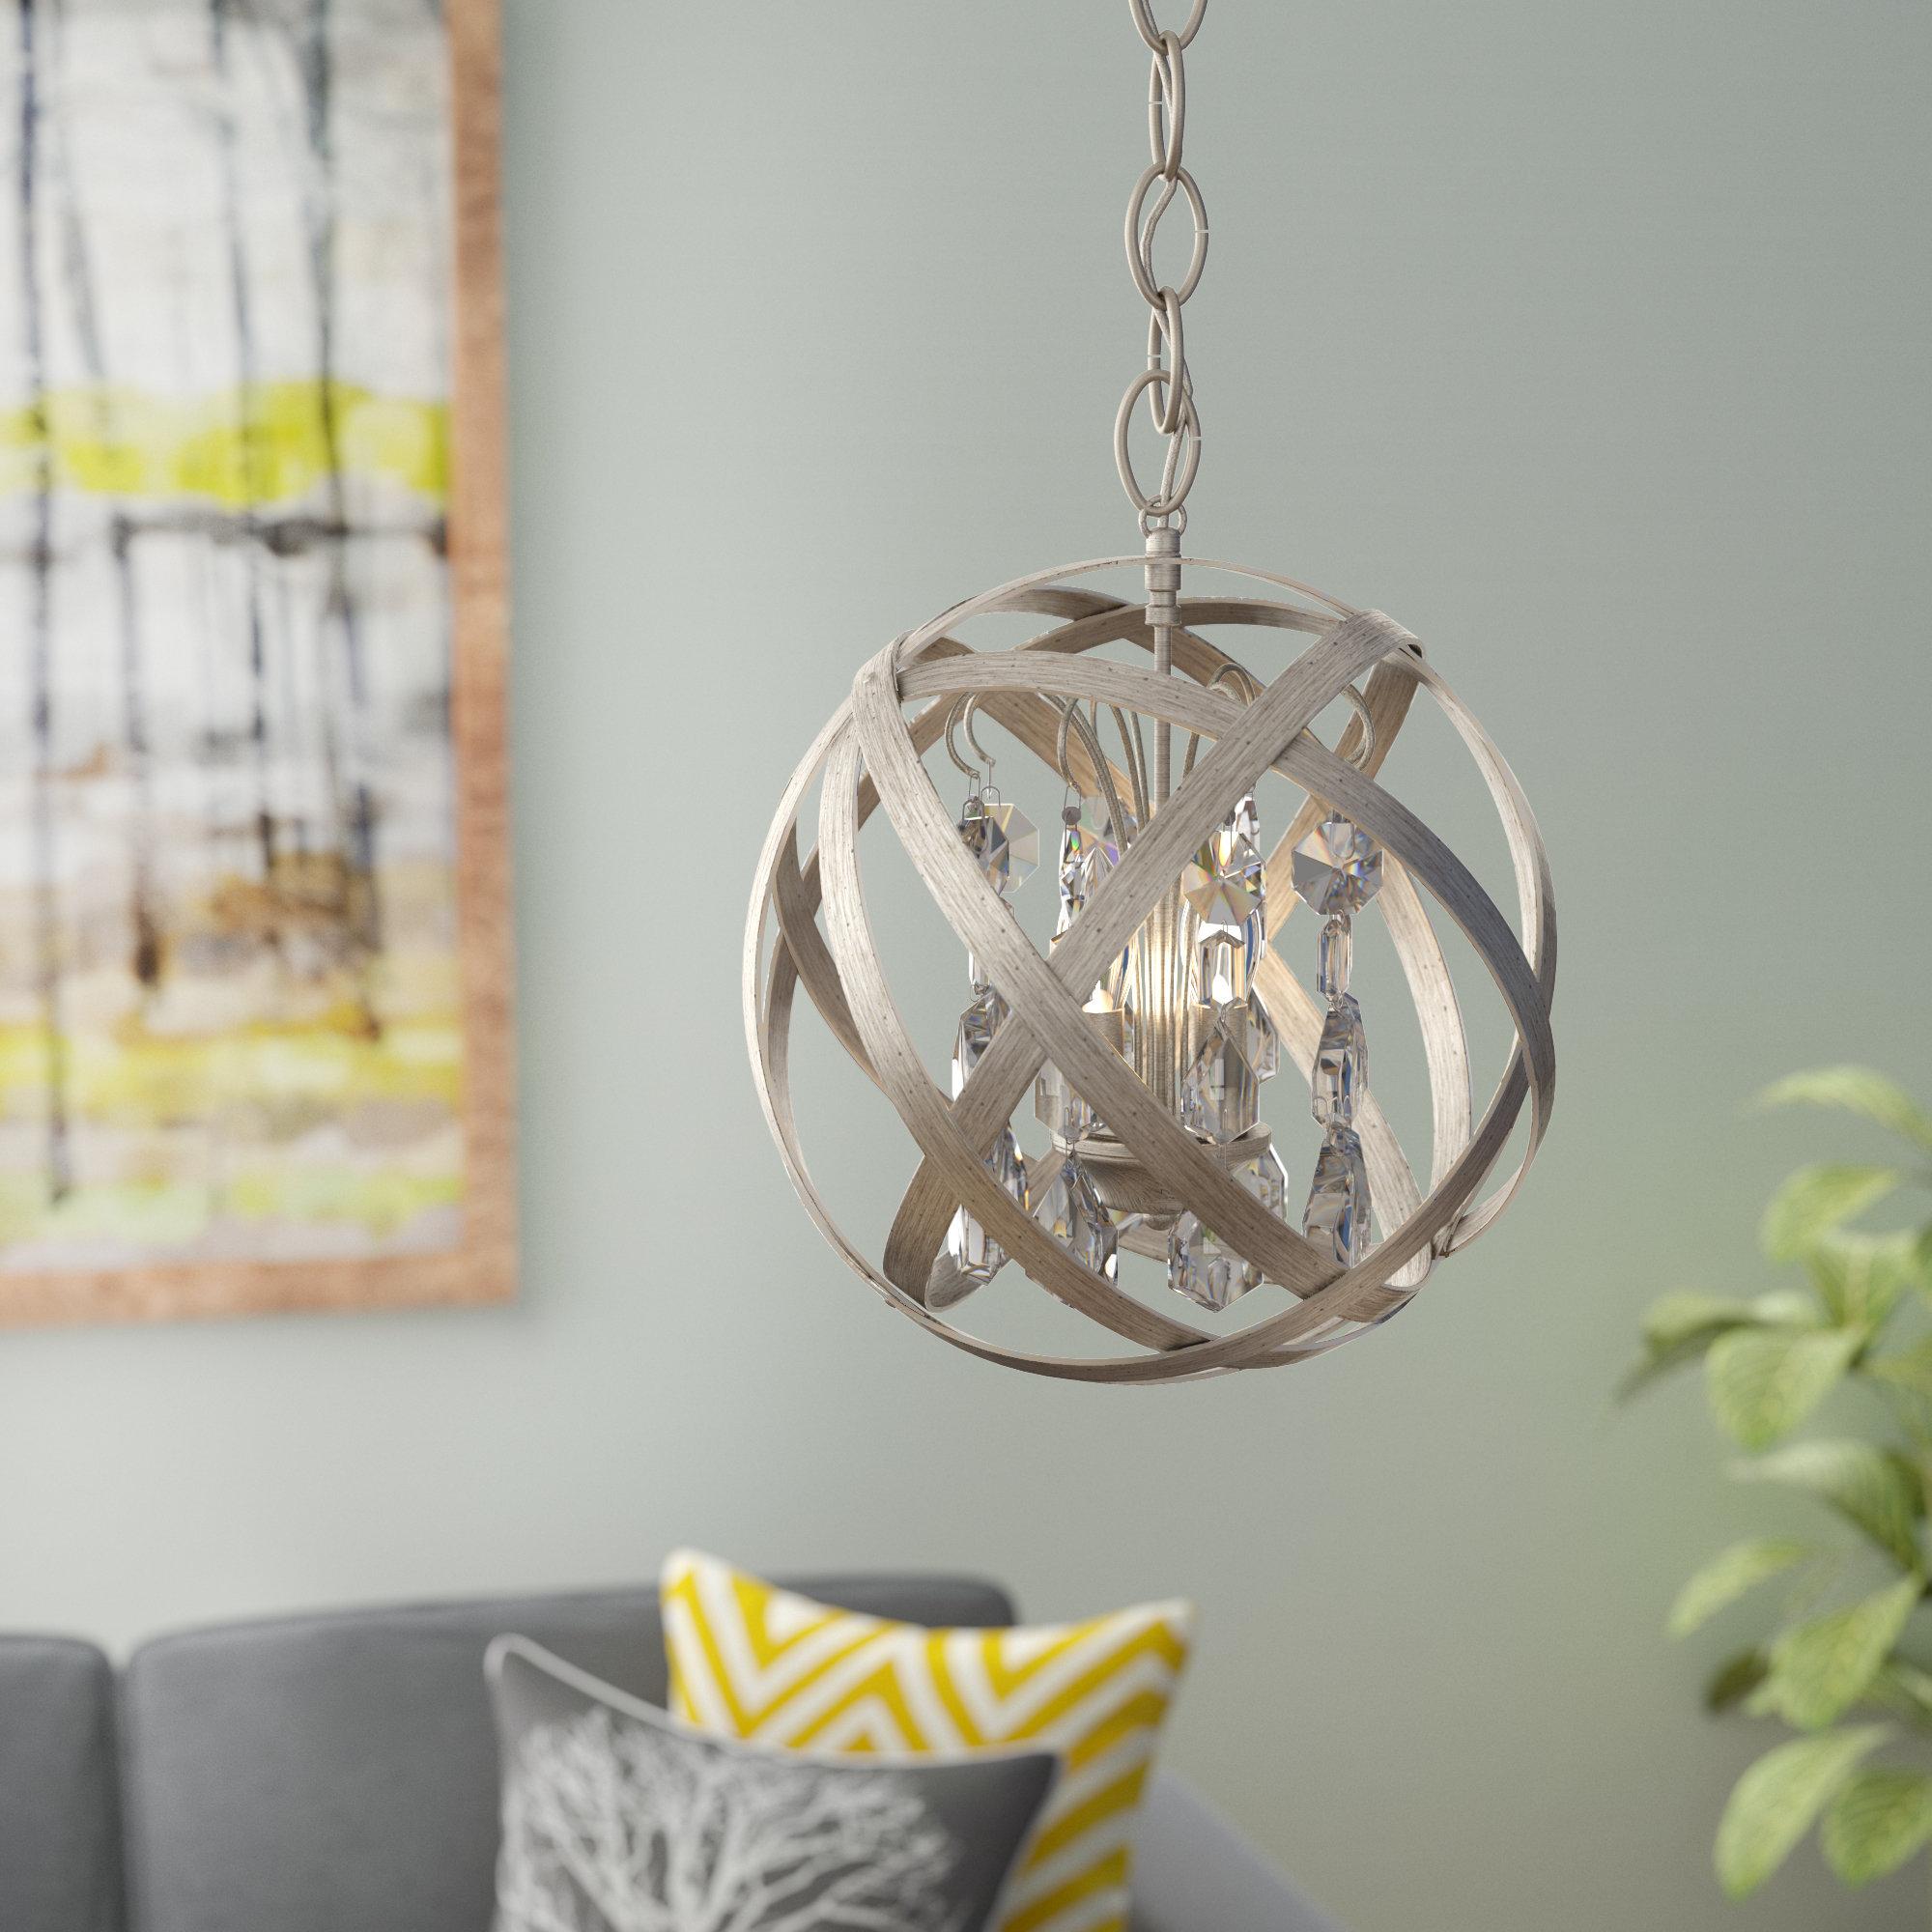 Adcock 3 Light Chandelier With Regard To Adcock 3 Light Single Globe Pendants (View 3 of 30)